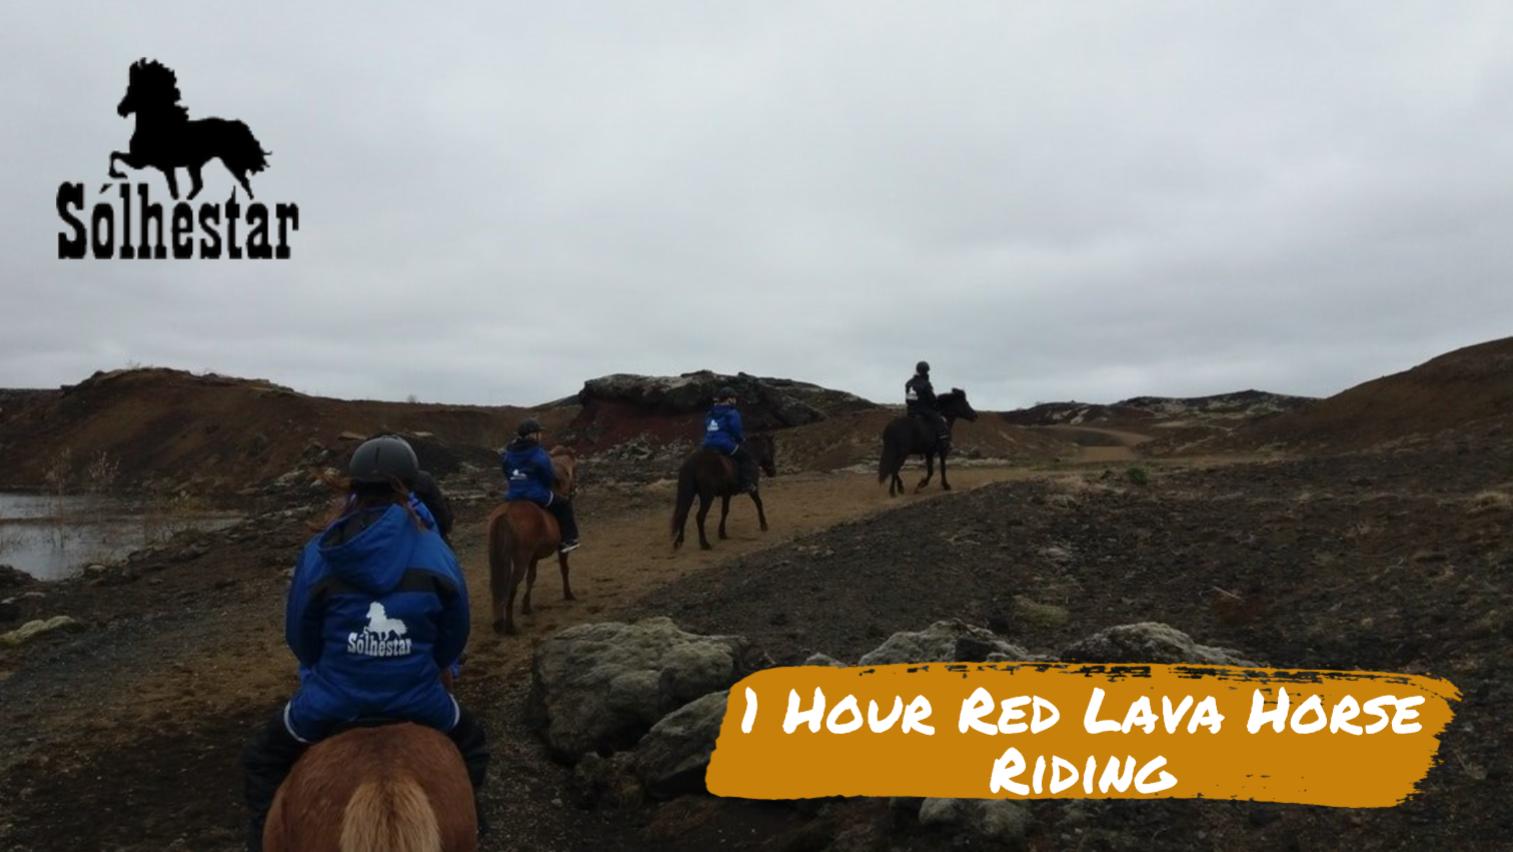 1 Hour Red Lava Horse Riding (Sólhestar Reykjavik